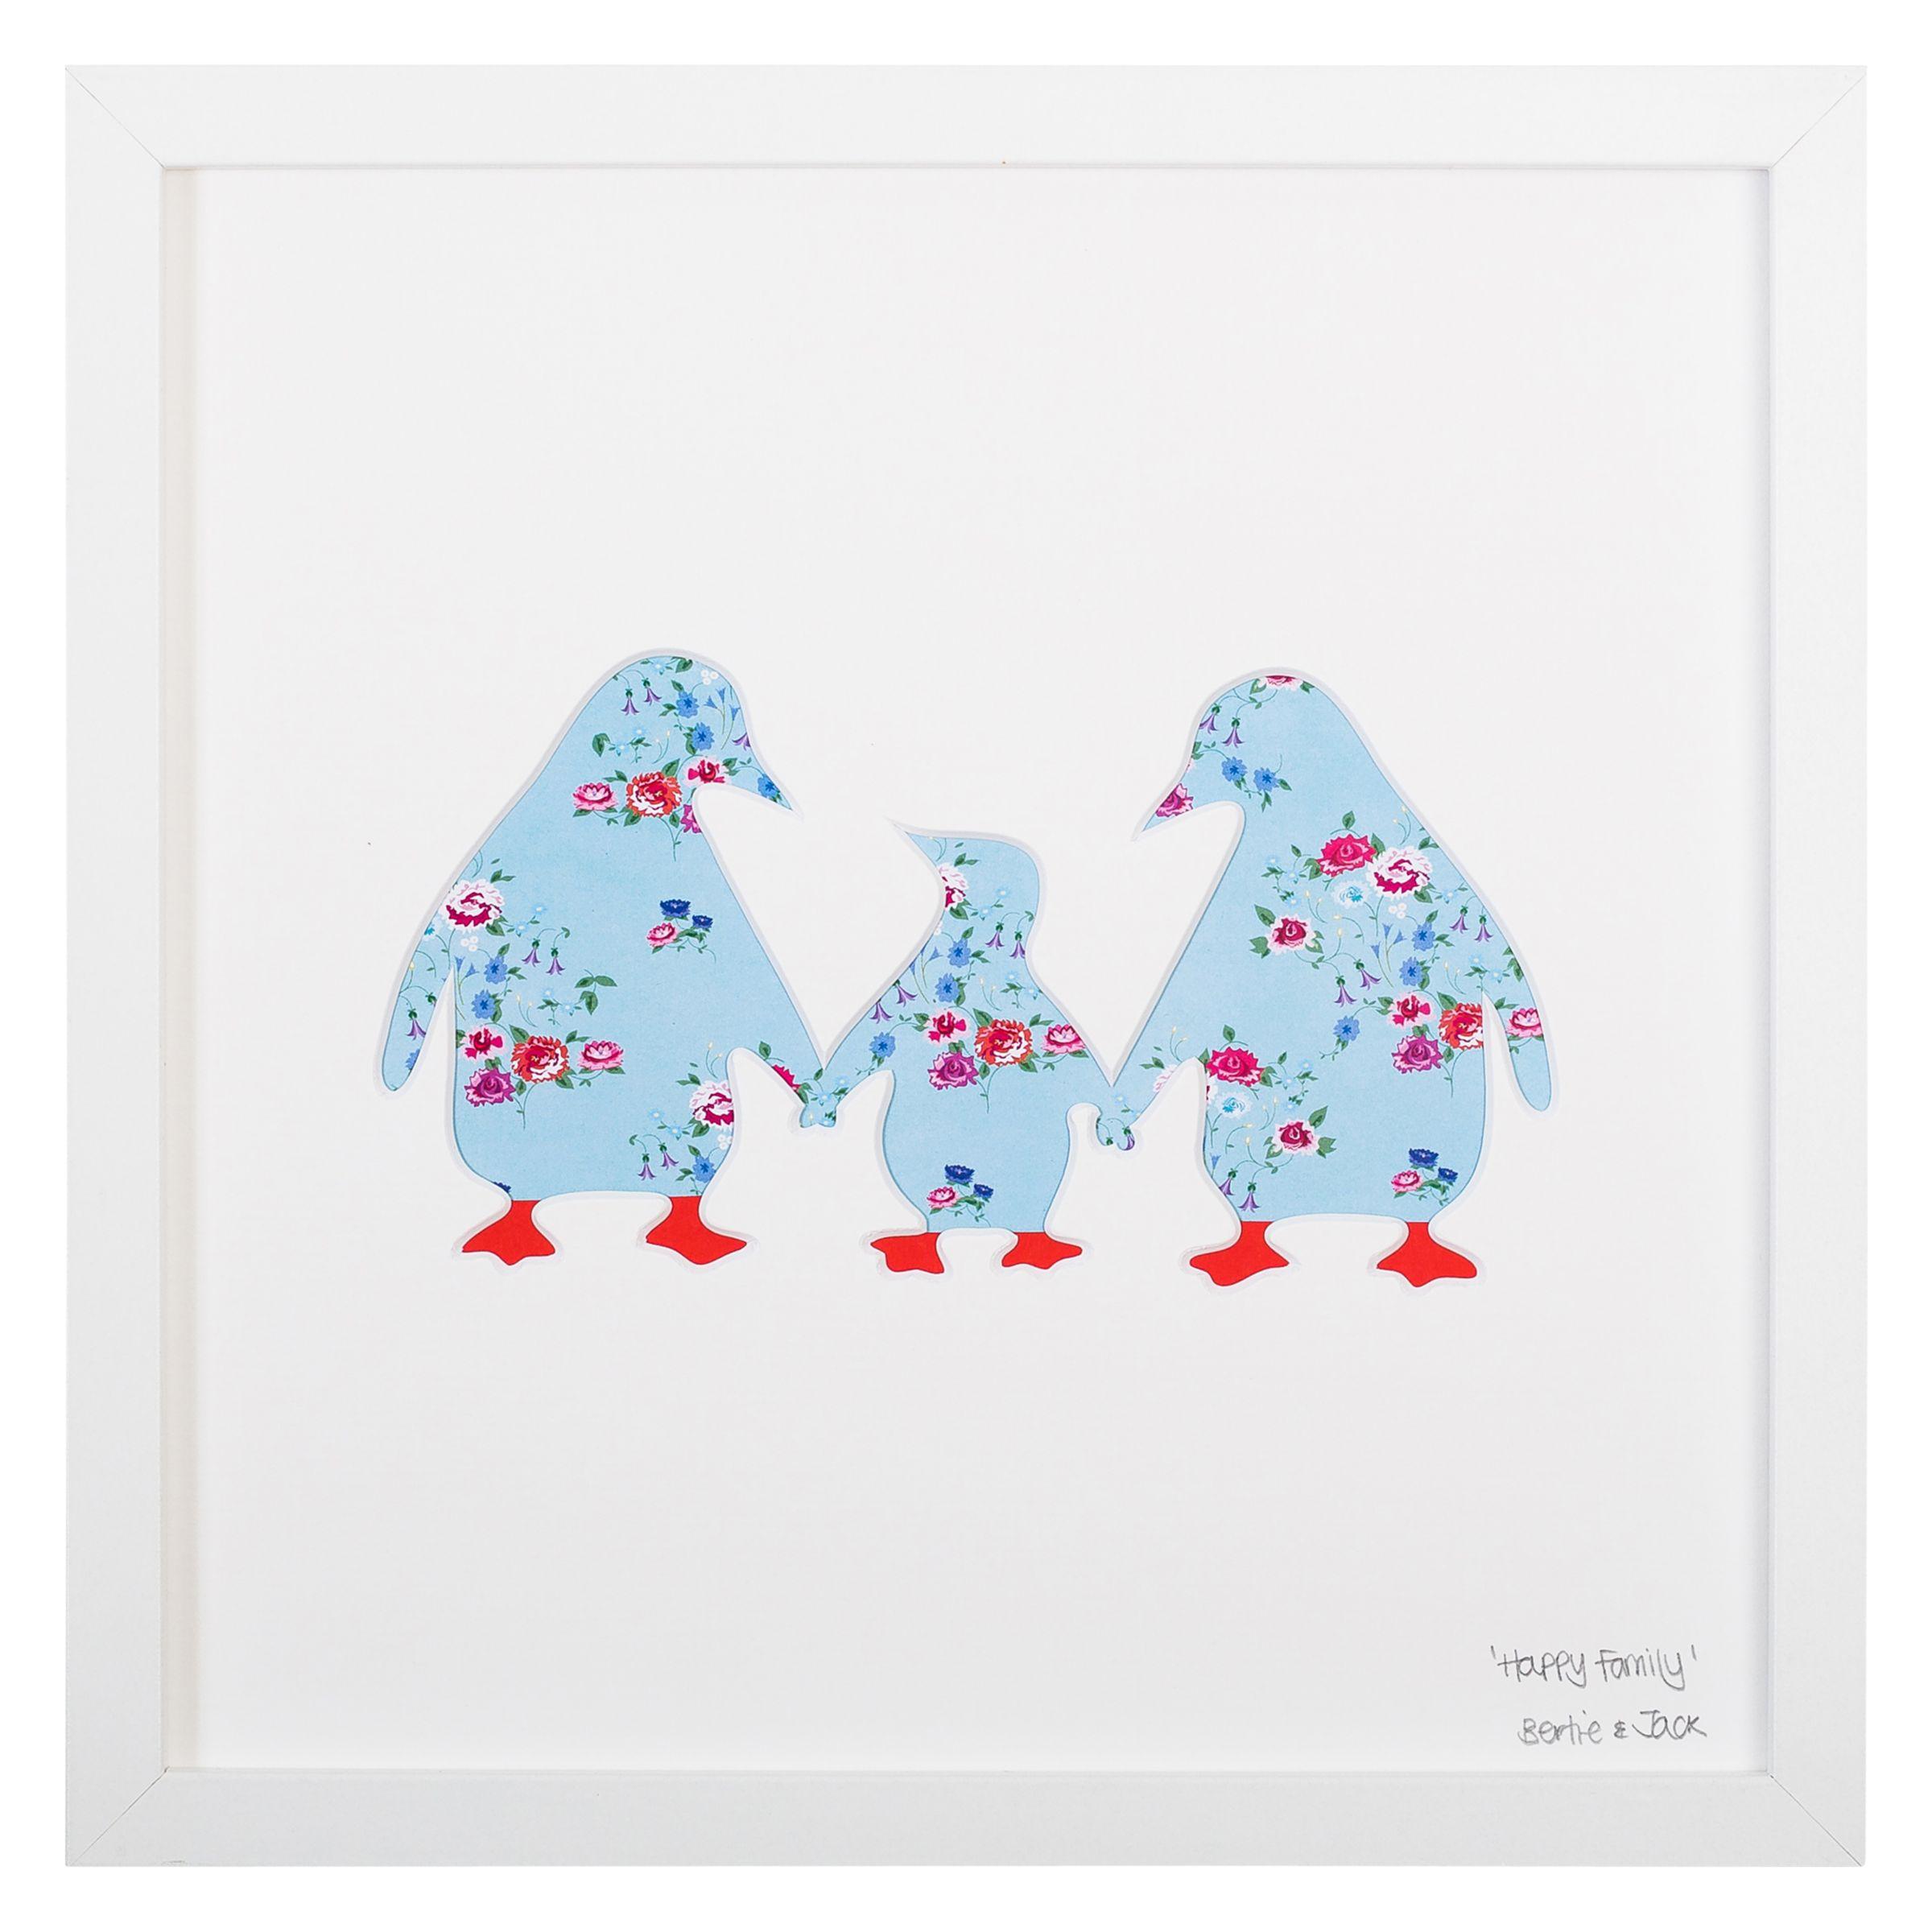 Bertie & Jack Bertie & Jack - Happy Family Framed 3D Cut-out, 27 x 27cm